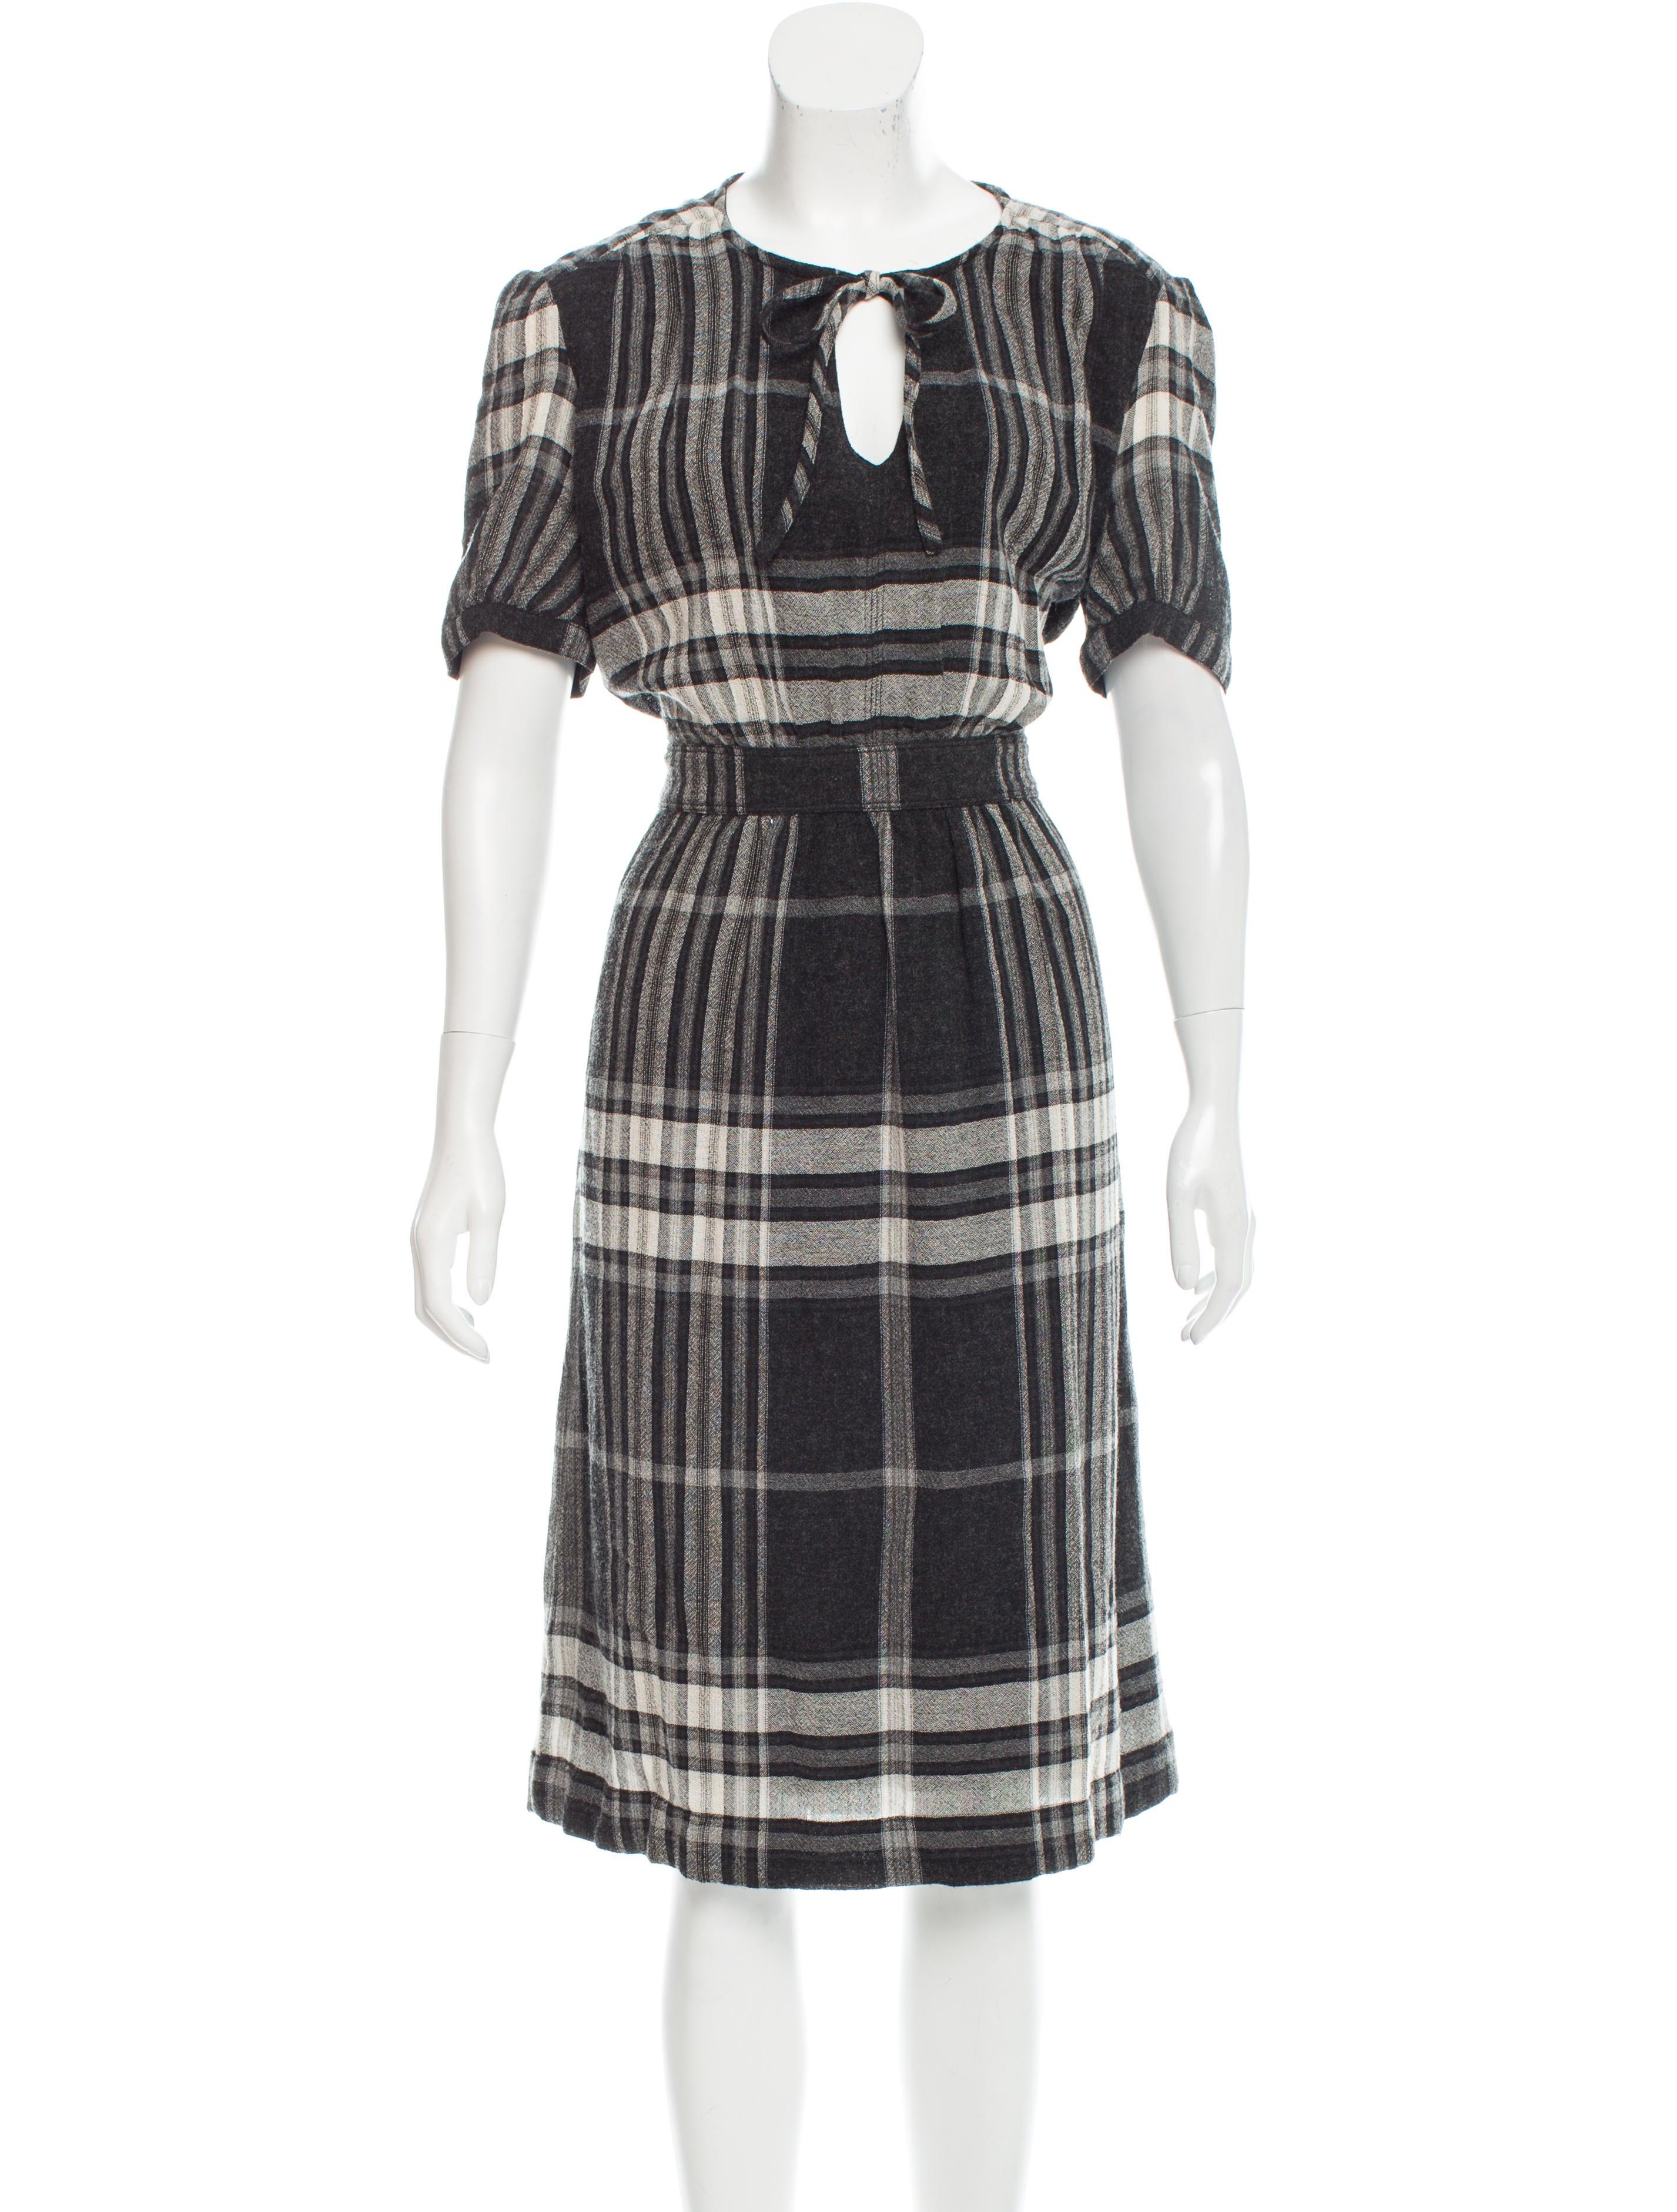 Burberry Brit Plaid Midi Dress Clothing Bbr27346 The